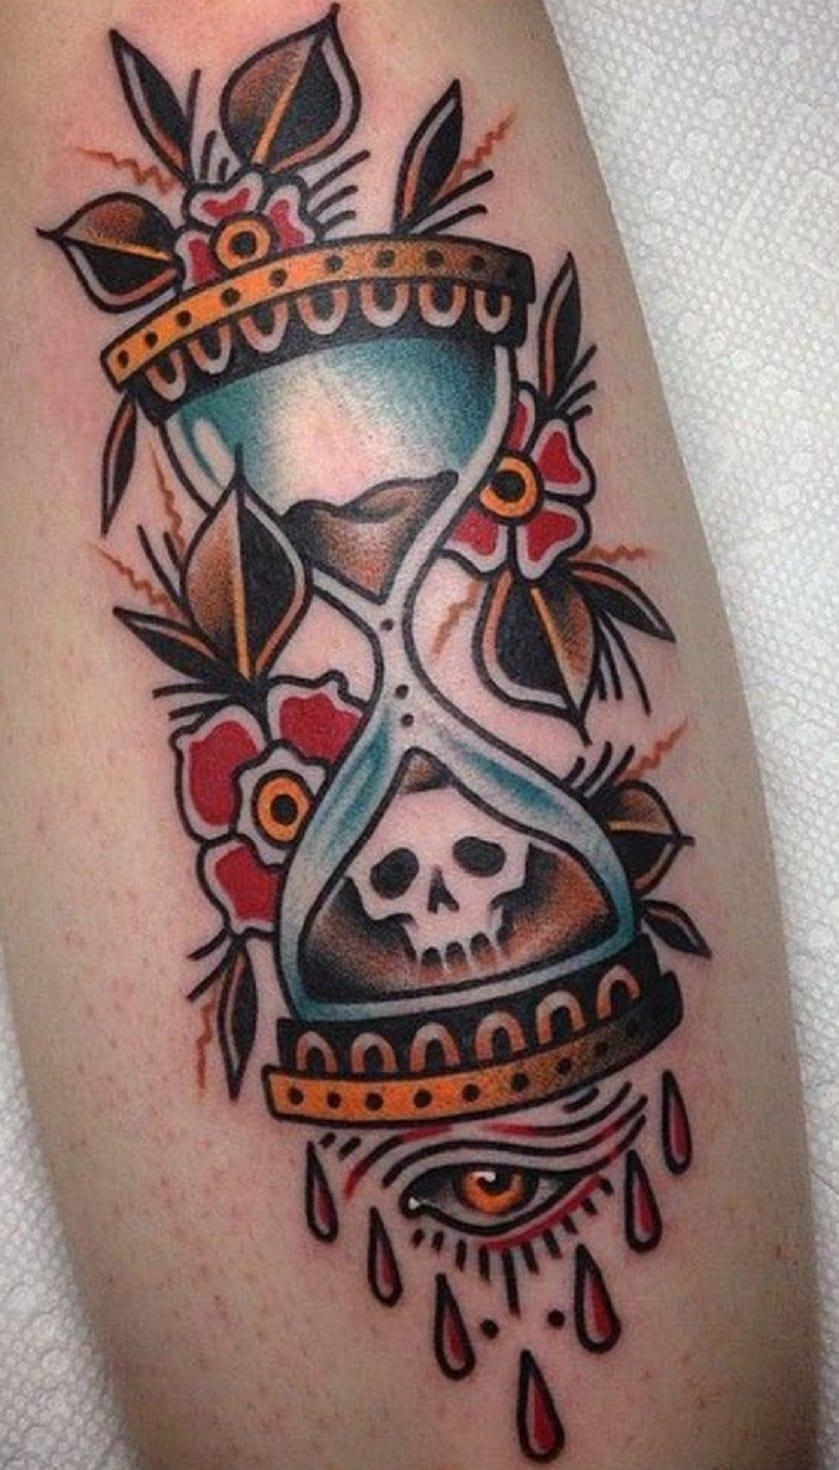 Tatuaje reloj de arena old school